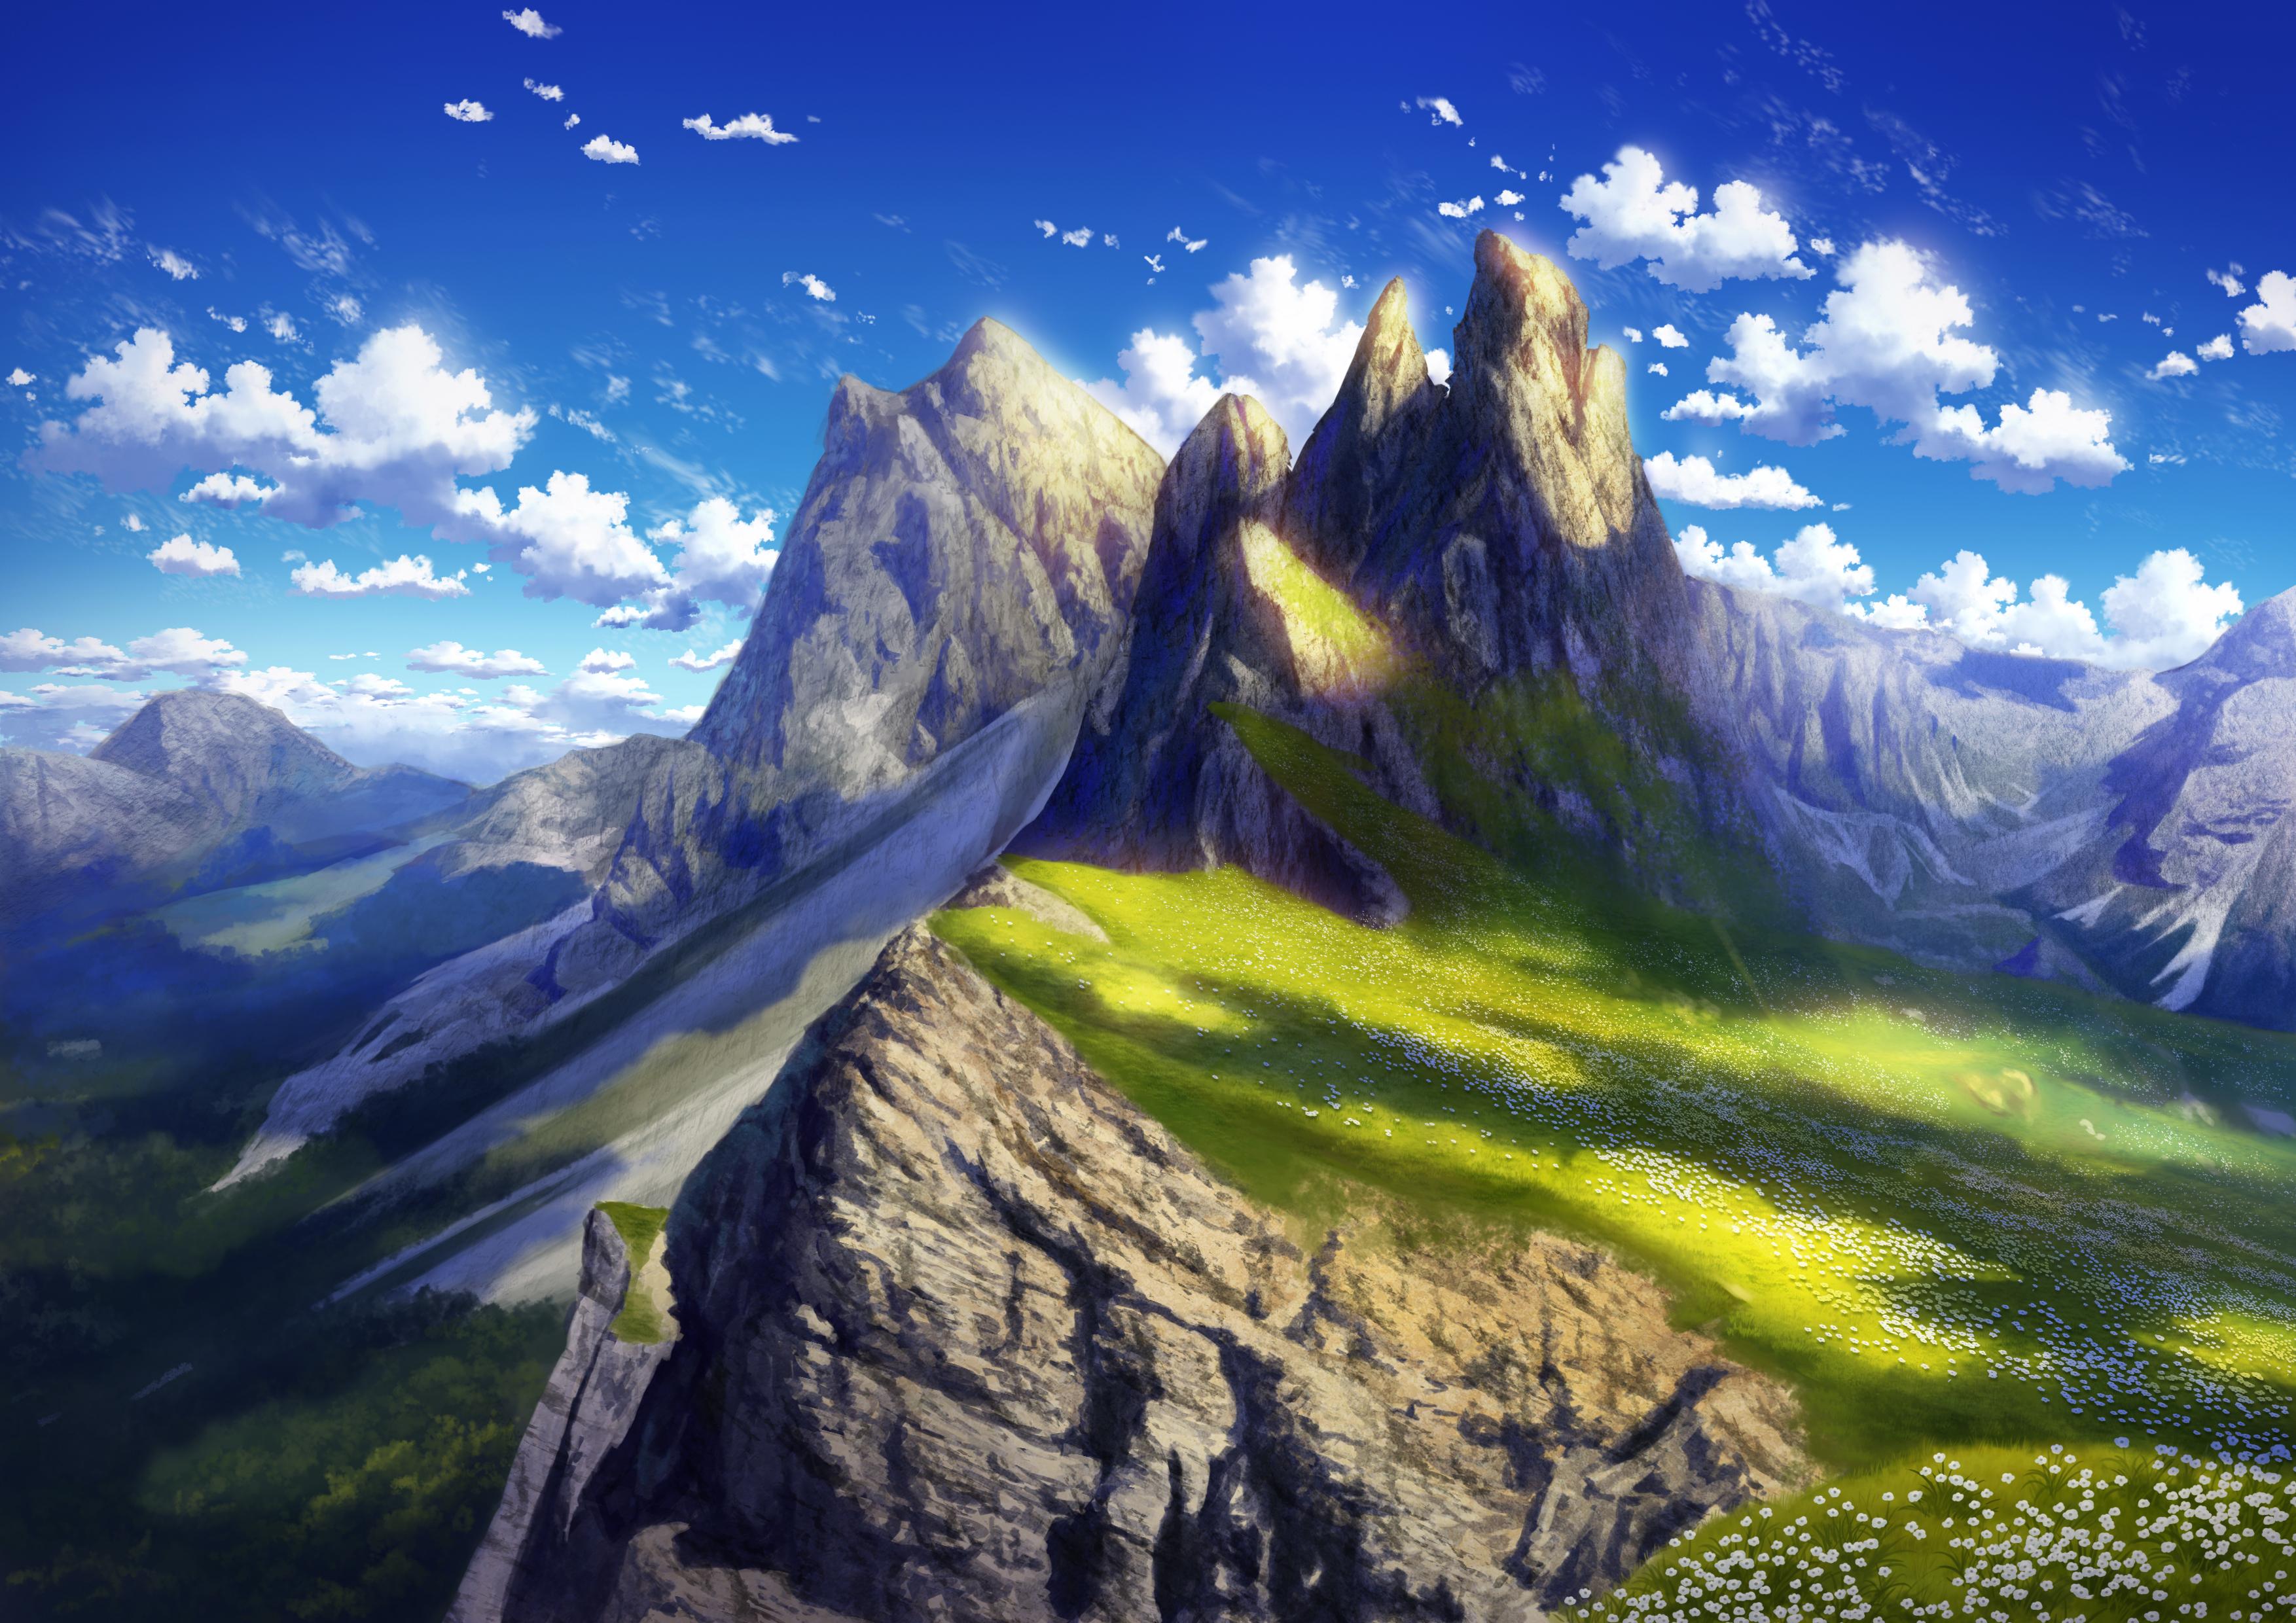 Anime Landscape 4k, HD Anime, 4k Wallpapers, Images ...